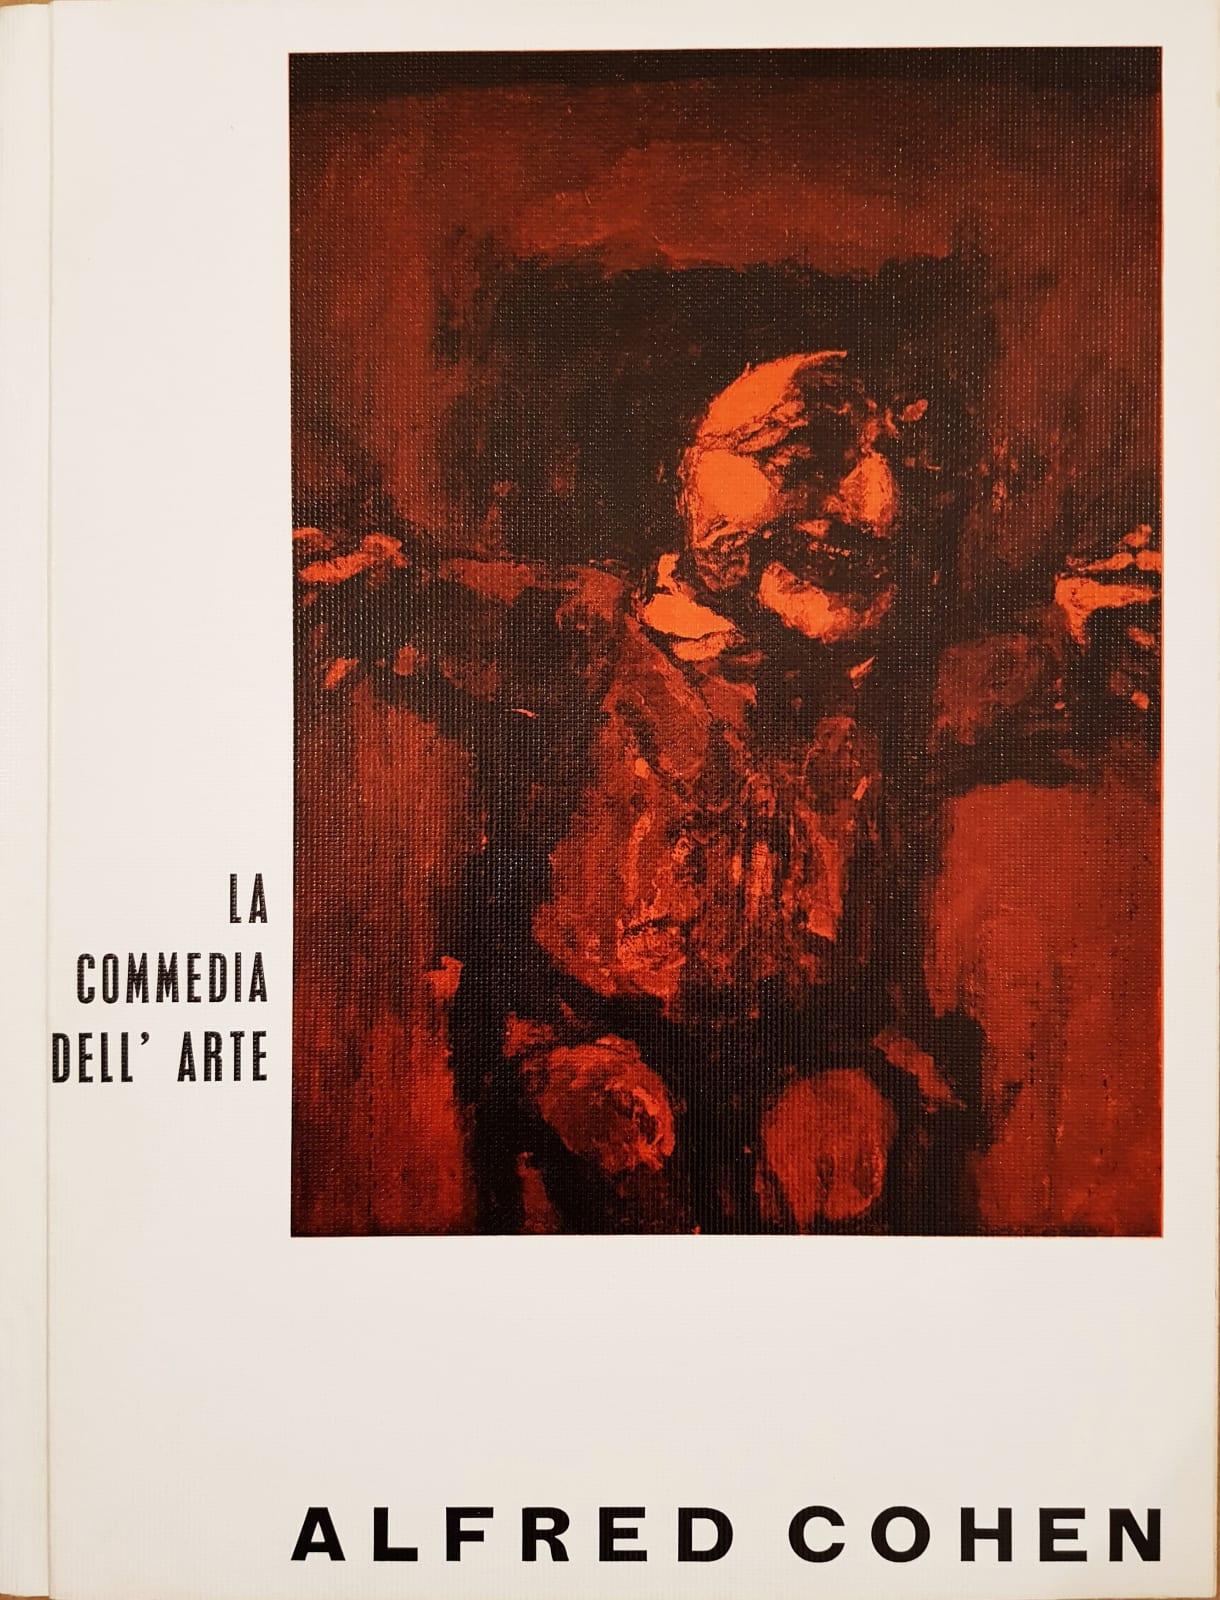 The Commedia dell'Arte / 1962-64 Alfred Cohen, La Commedia dell'Arte 1963 - Catalogue published by the Brook Street Gallery, London W.1